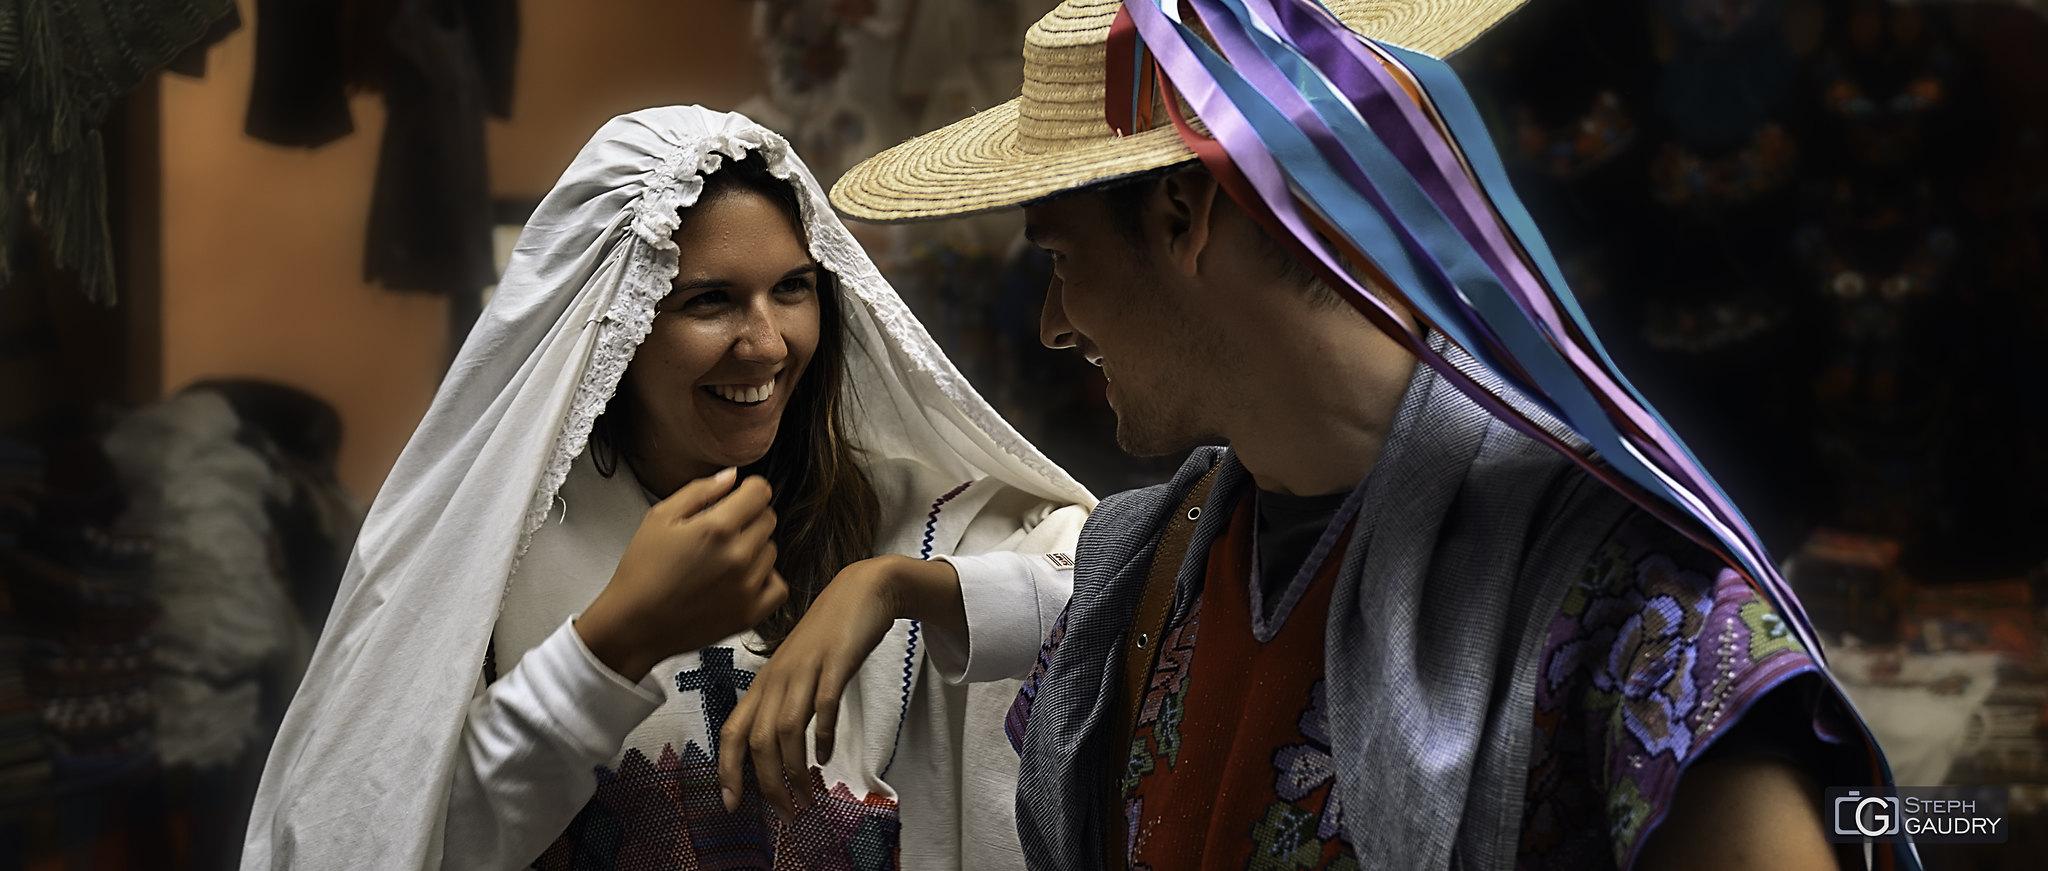 Mariage mexicain - Clarisse et Tom [Klik om de diavoorstelling te starten]